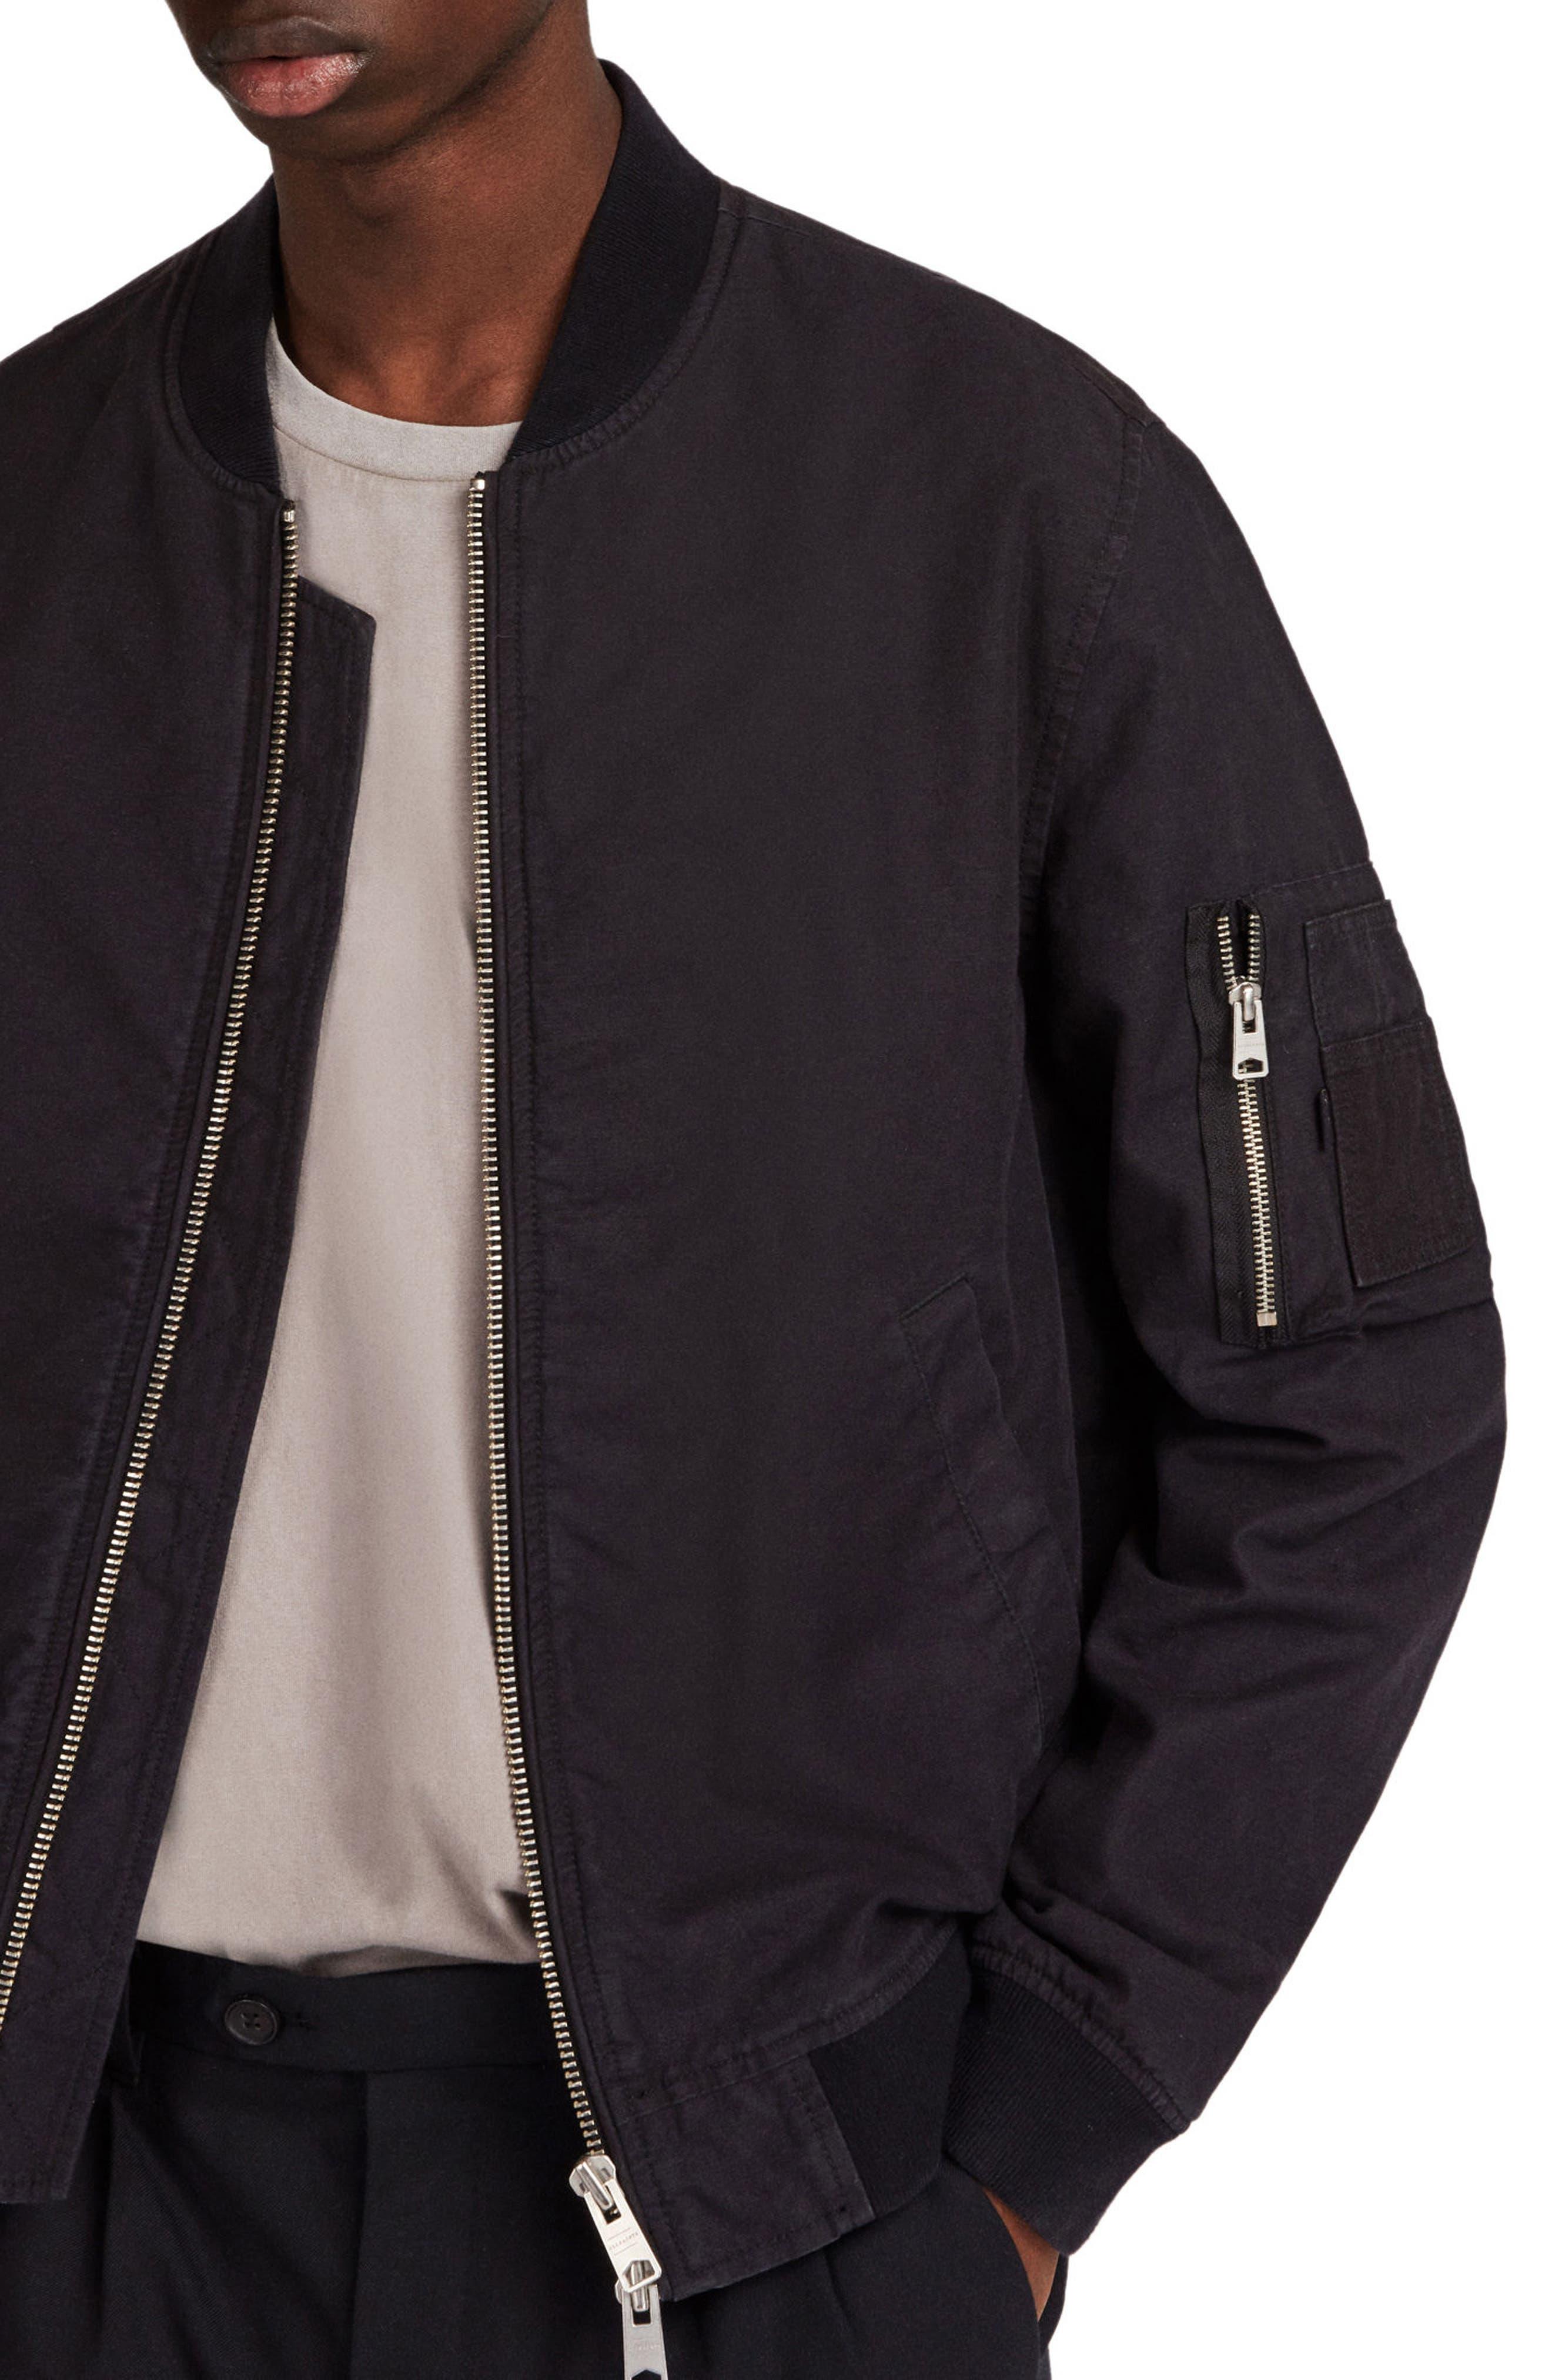 Moyne Bomber Jacket,                             Alternate thumbnail 3, color,                             Black